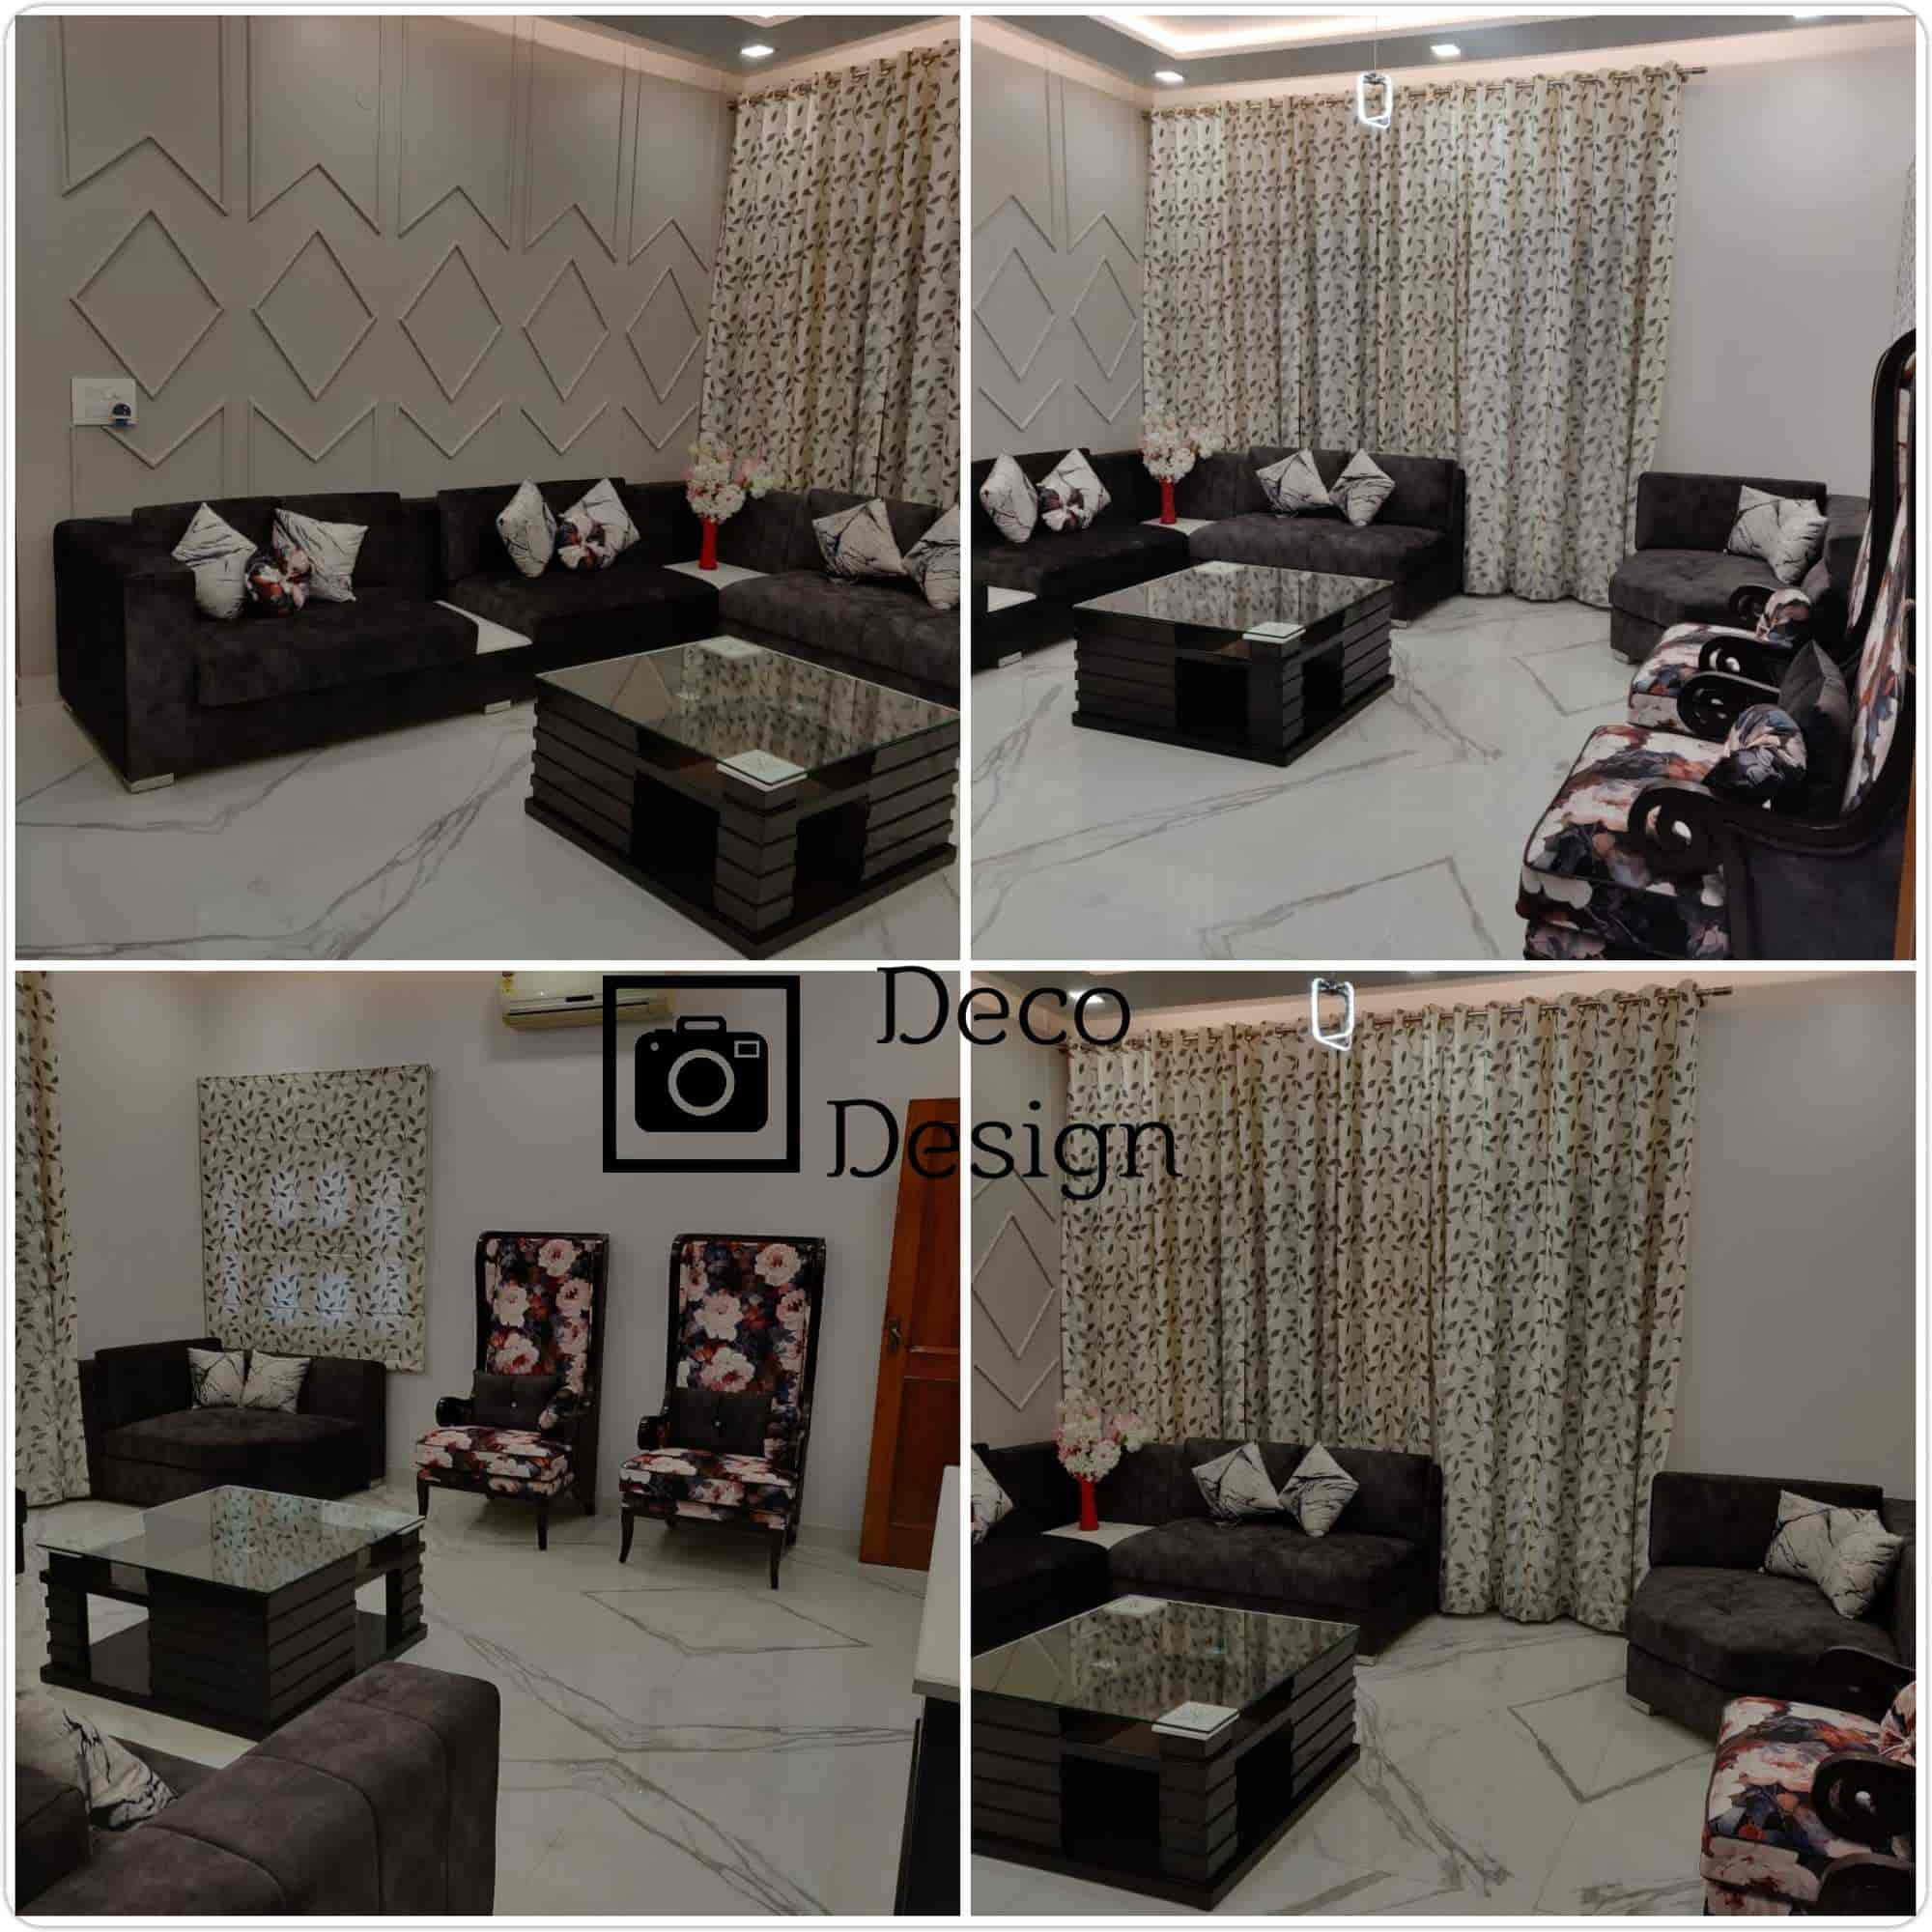 Deco design anand vihar interior designers in delhi justdial